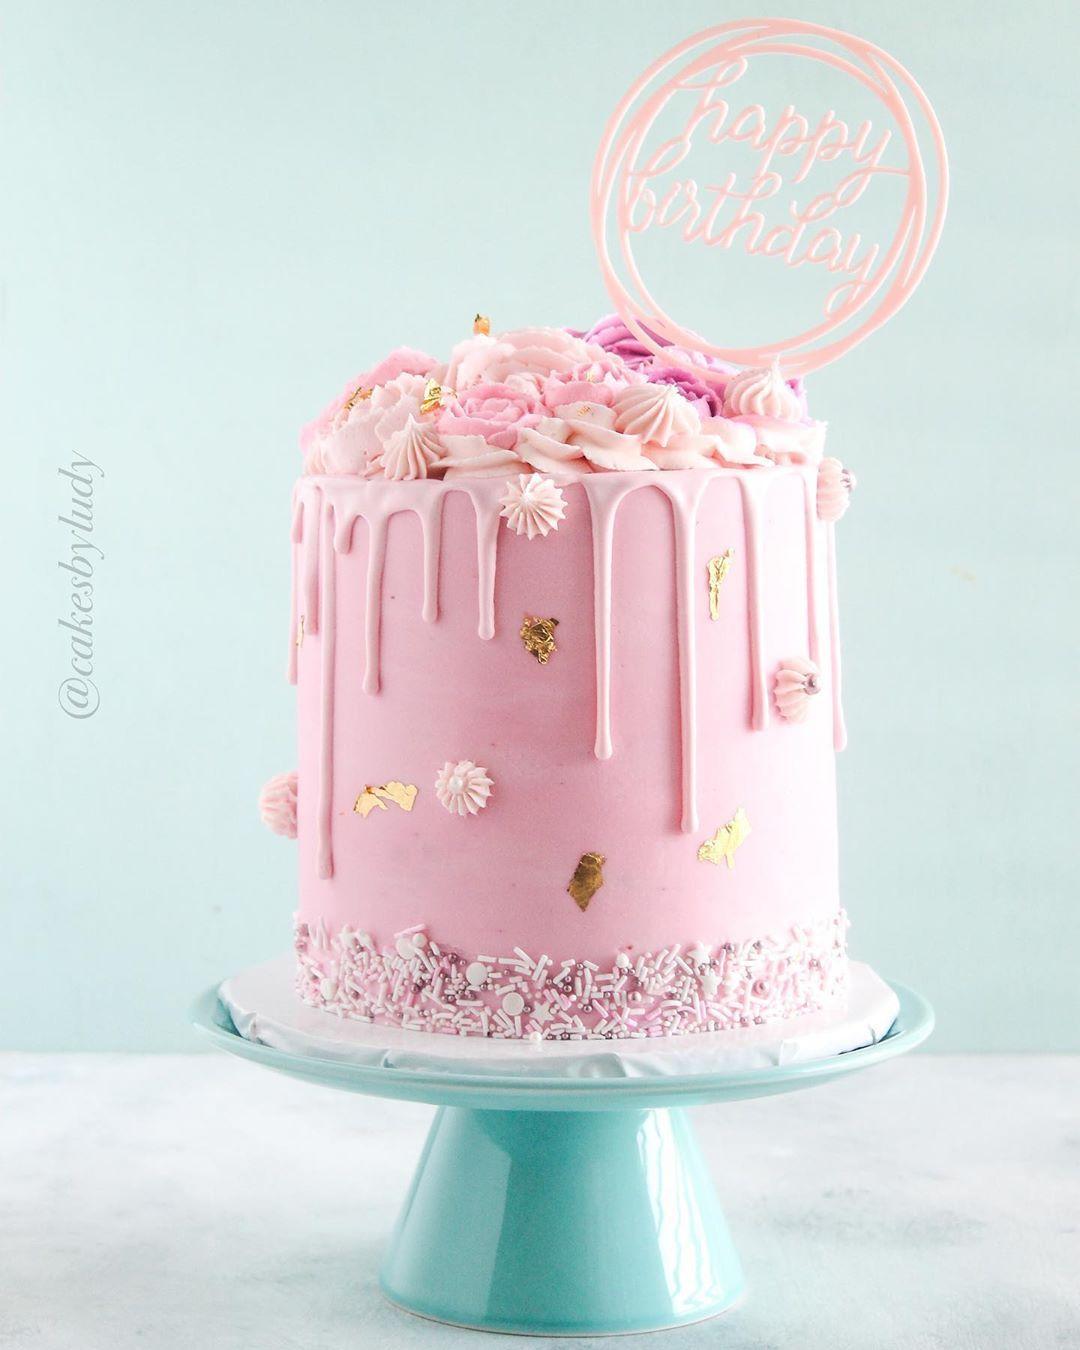 "Ludy| Cakes By Ludy on Instagram: ""One of my faves to date! 💗 . . . #birthdaycake #pinkcake #flowercake #dripcake #elegantcake #cakespiration #bakersofinstagram #igcakes…"""